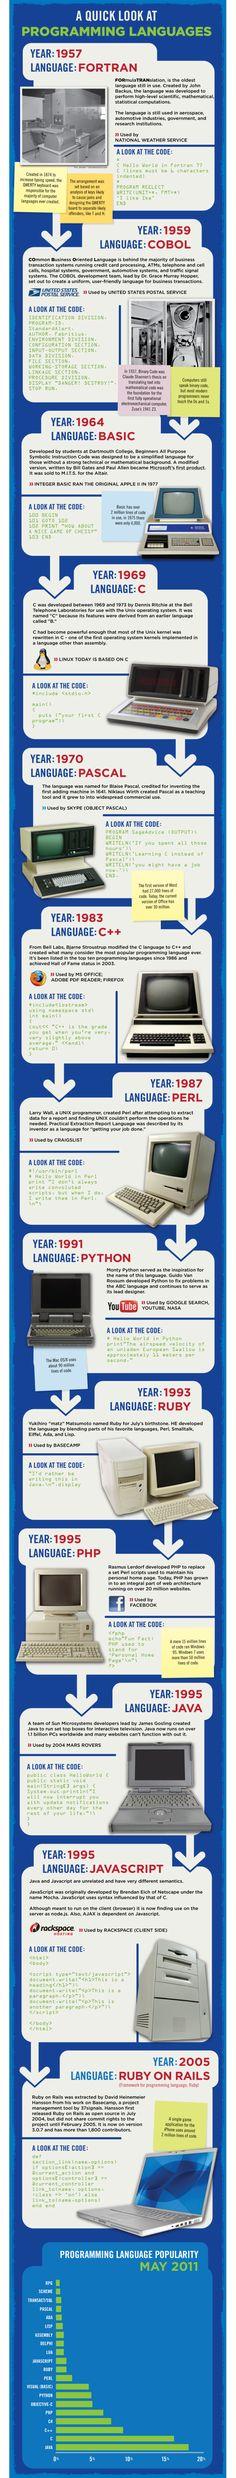 Evolution of Computer Languages